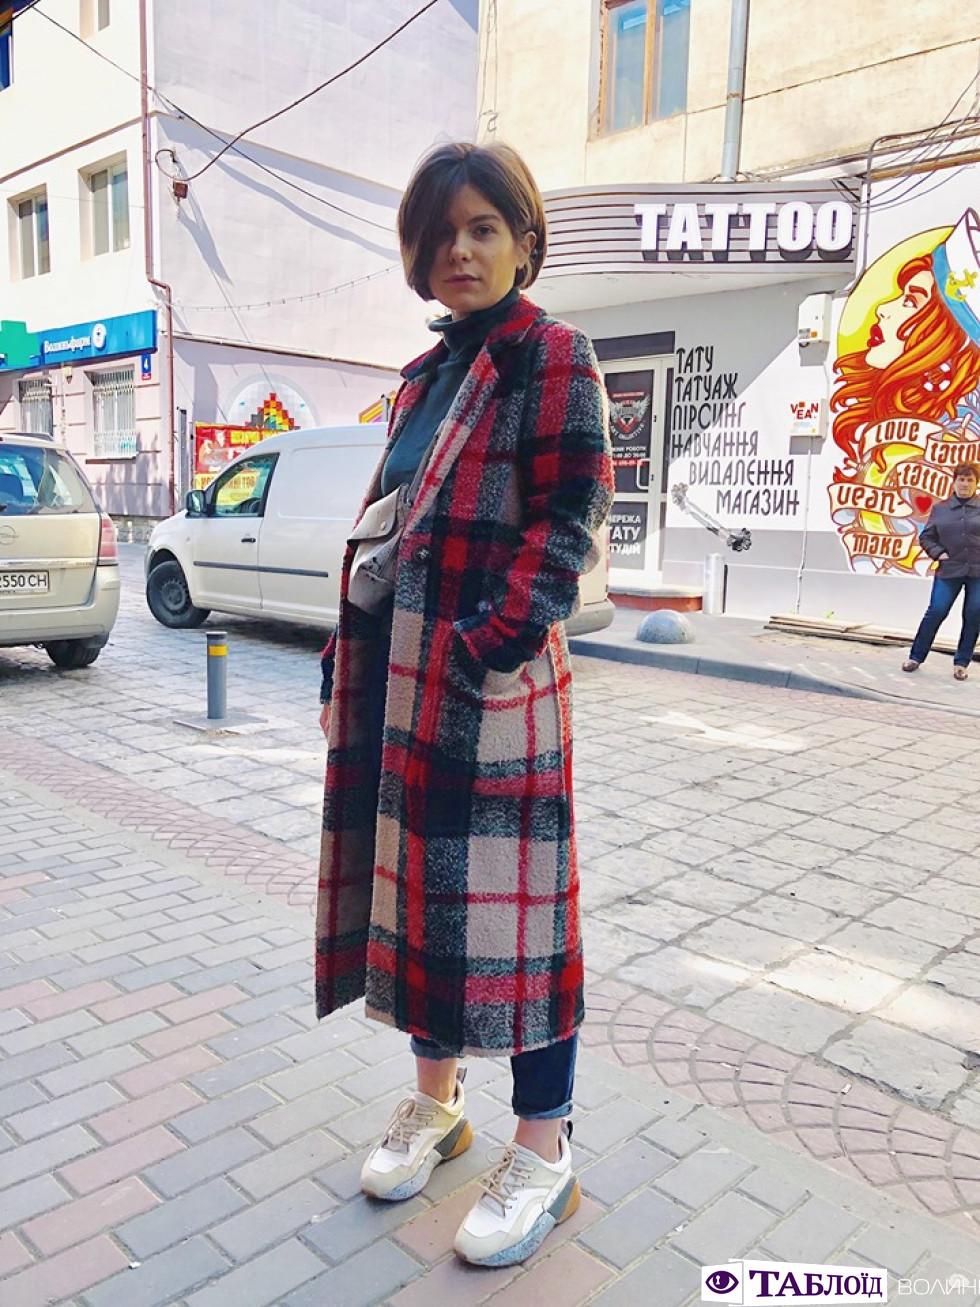 Вулична мода Луцька: переможниця Мар'яна